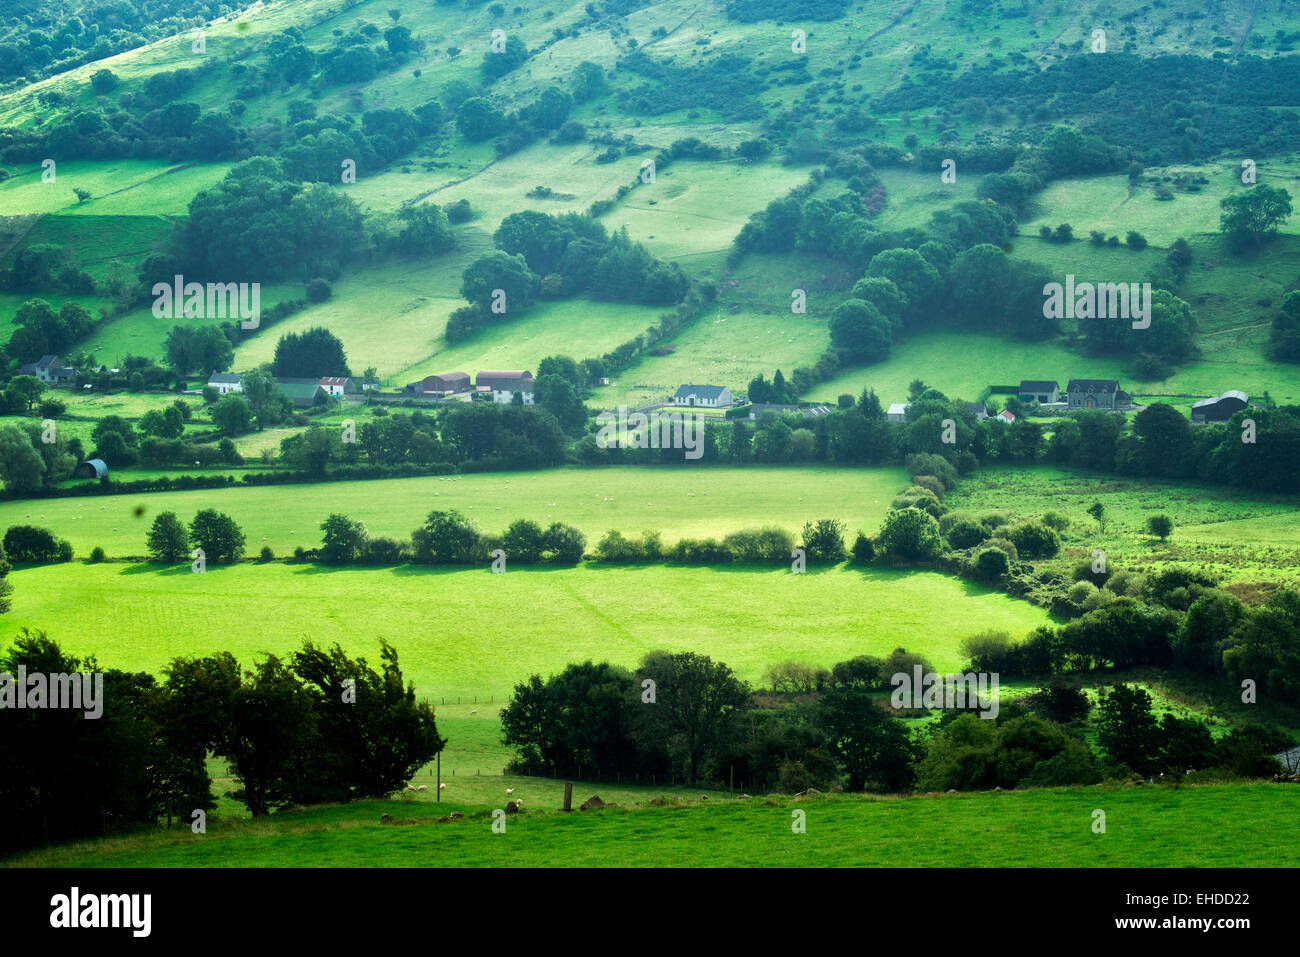 Vallée de Glenariff Forest Park Glenariff, Irlande du Nord Photo Stock